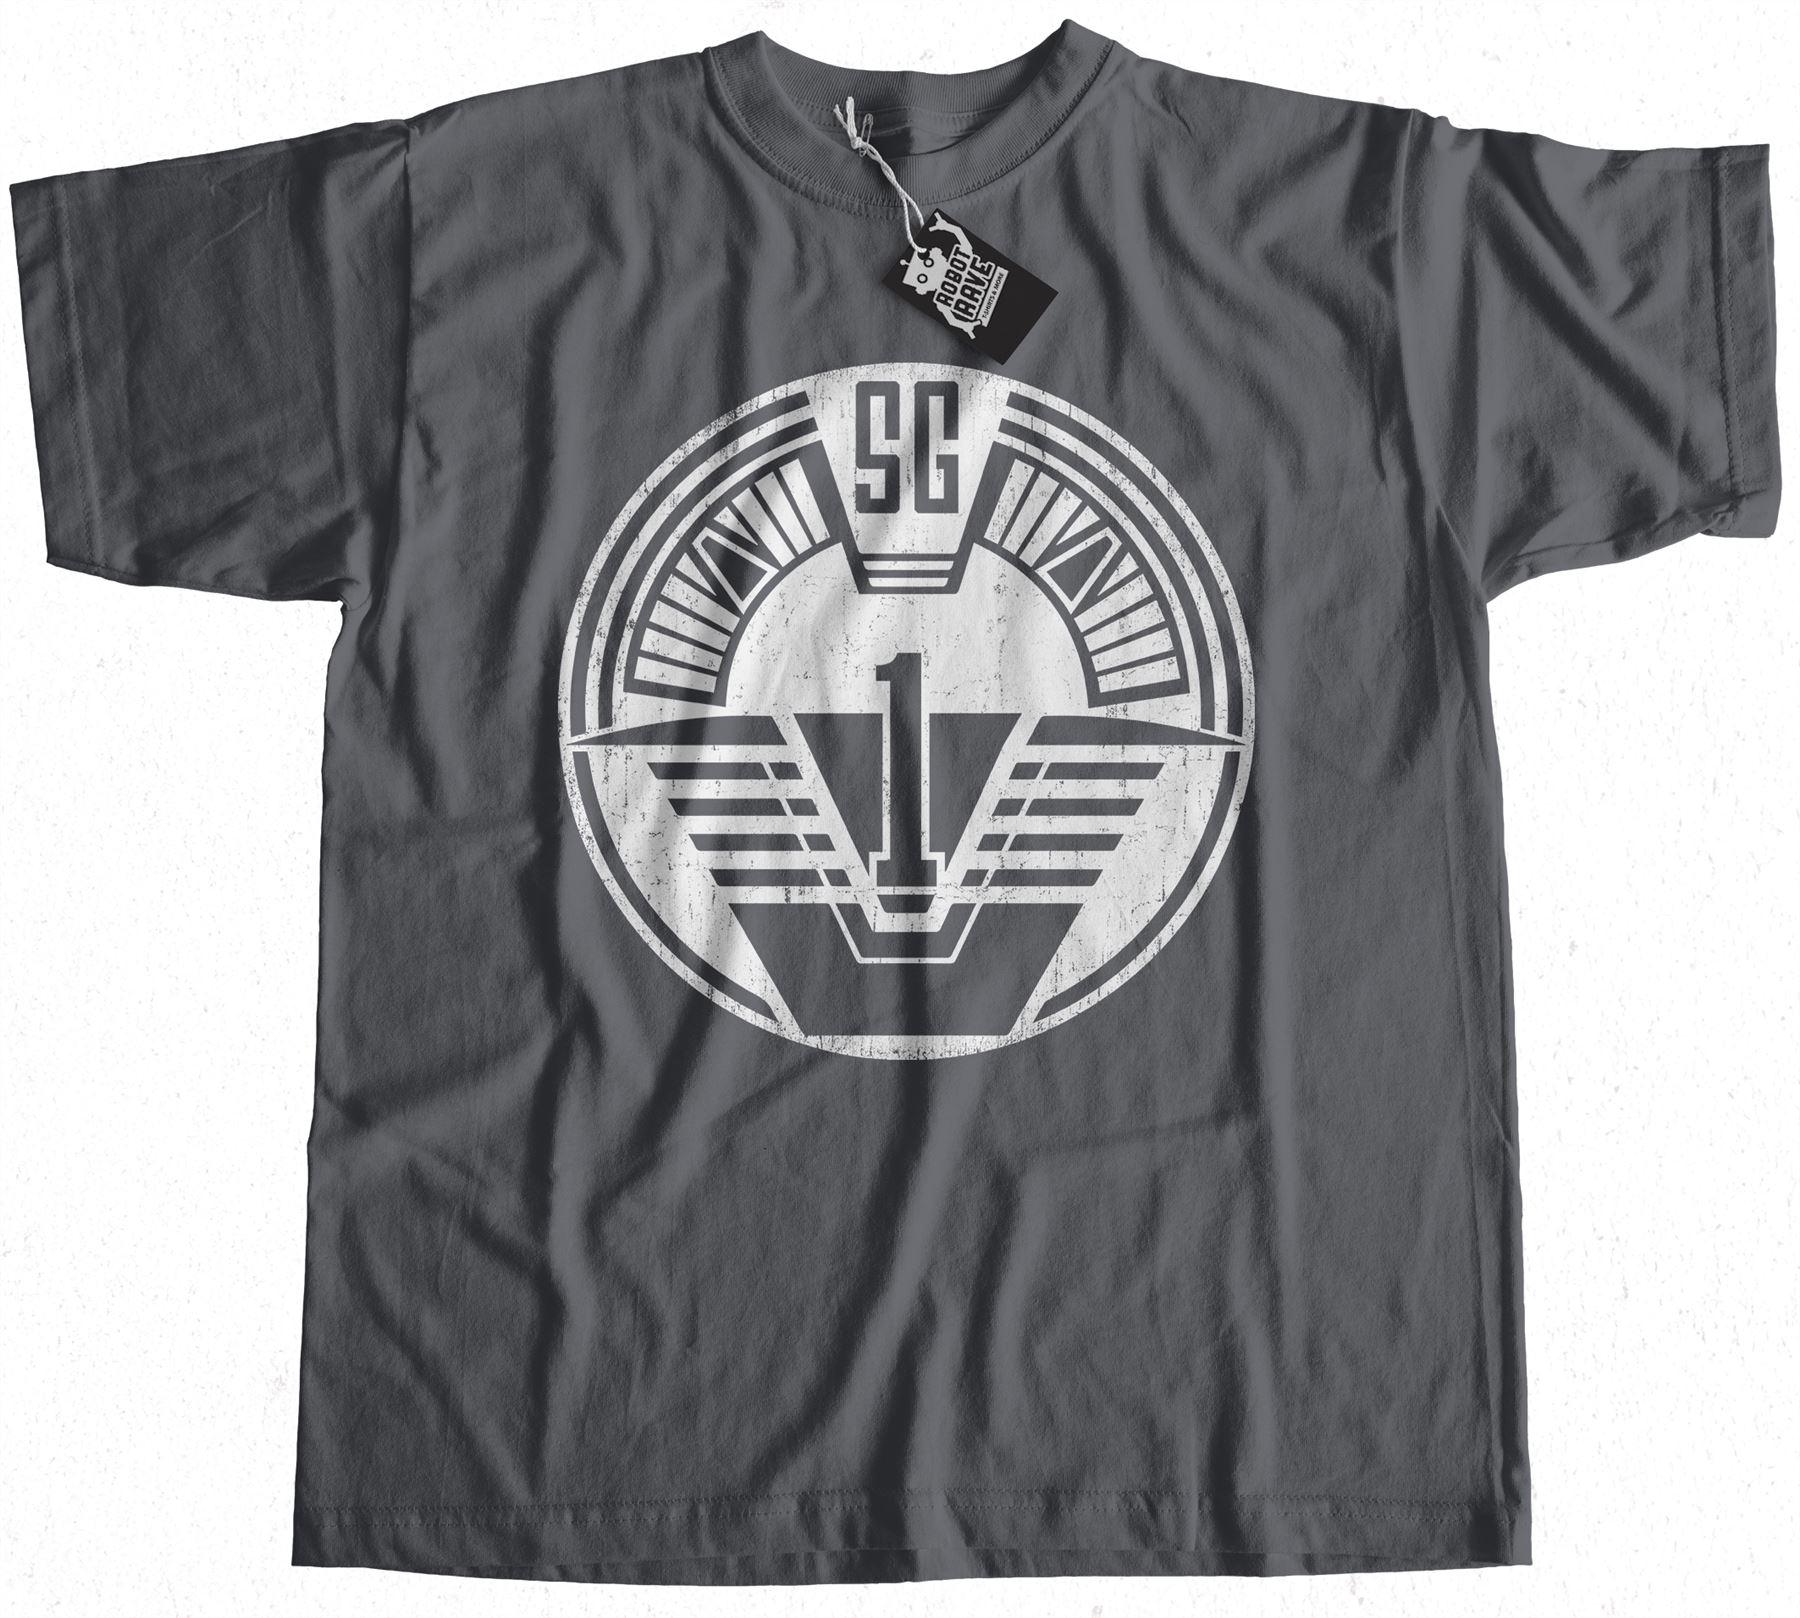 SG1-T-Shirt-100-Premium-Cotton Indexbild 11